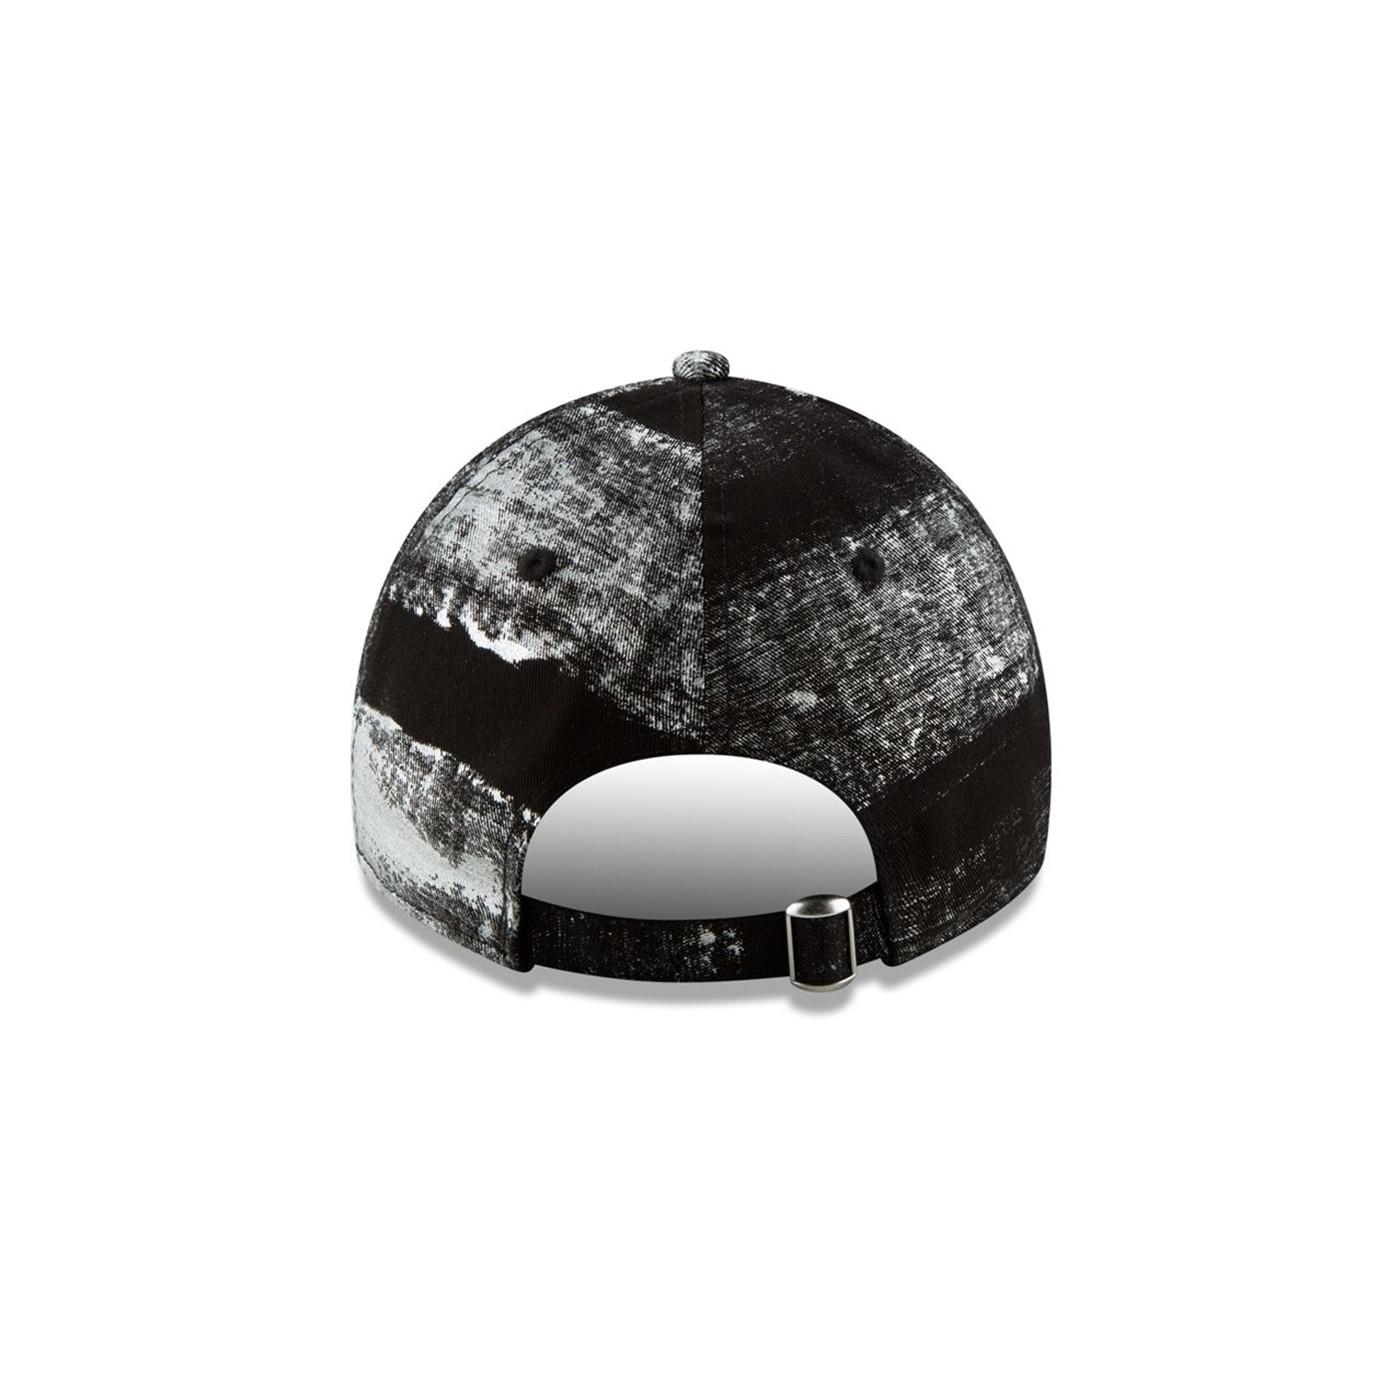 Batman Shades of Black New Era 9Twenty Adjustable Hat